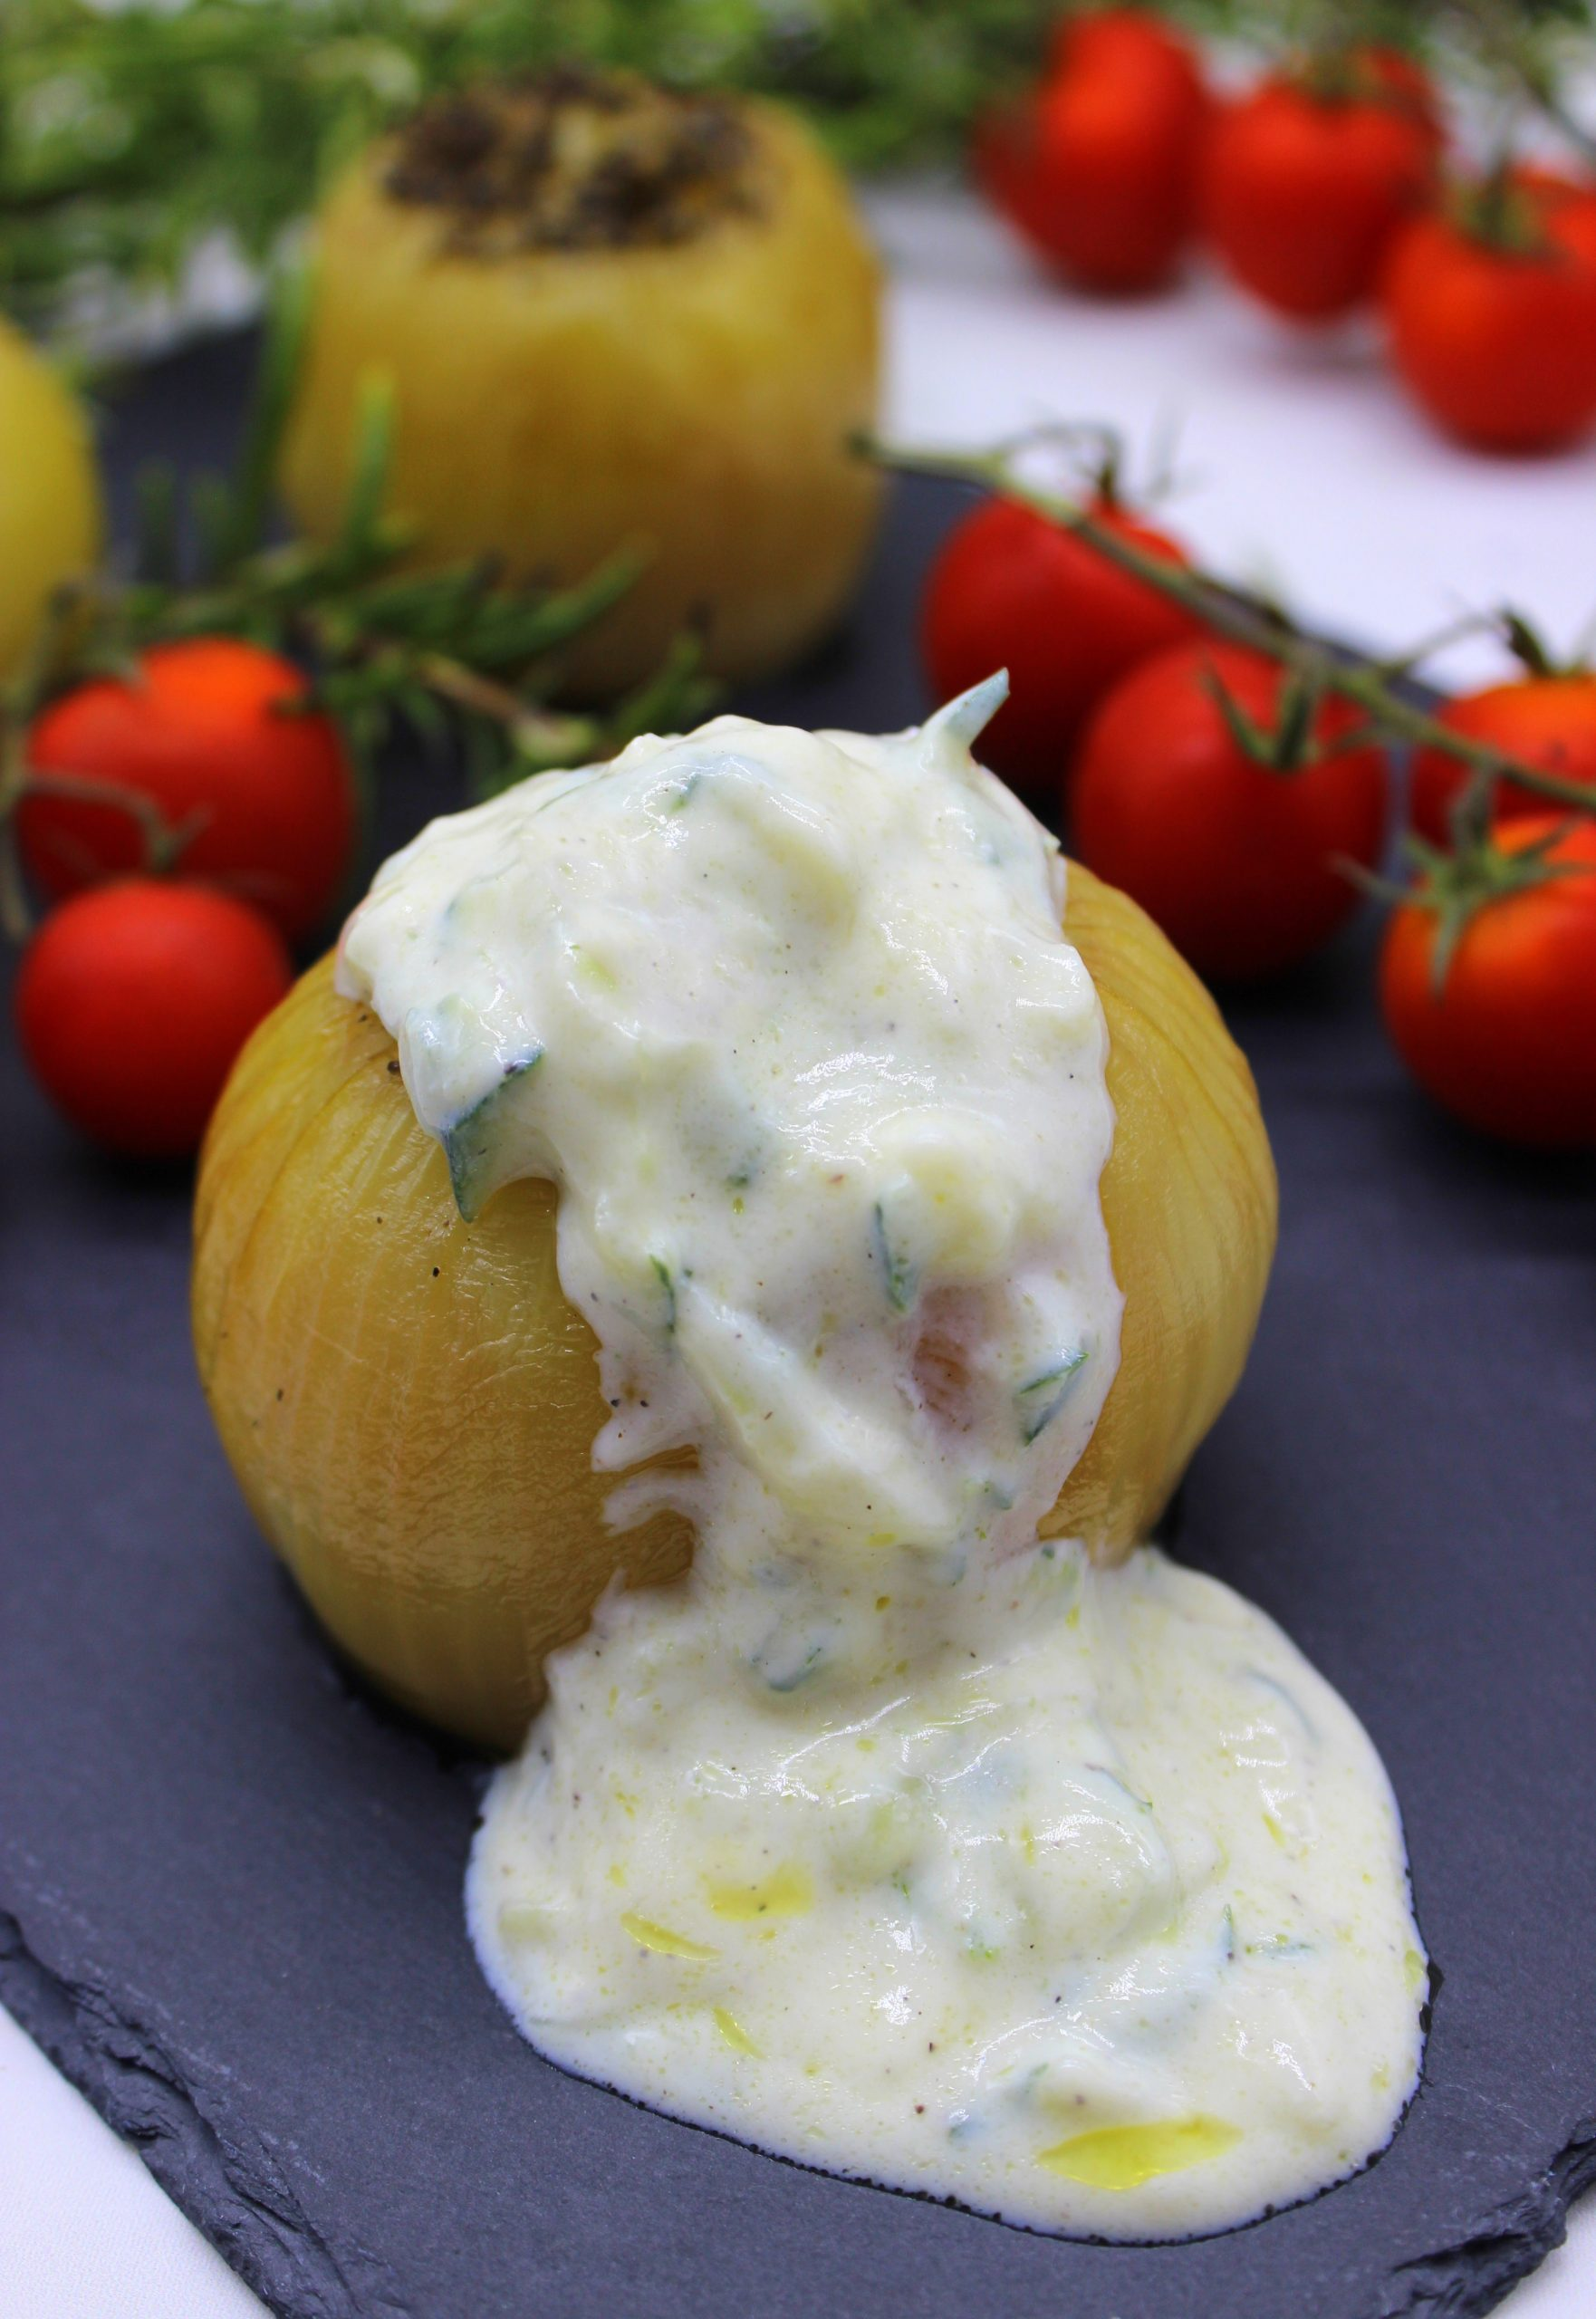 Juicy sweet roasted onions with Tzatziki sauce